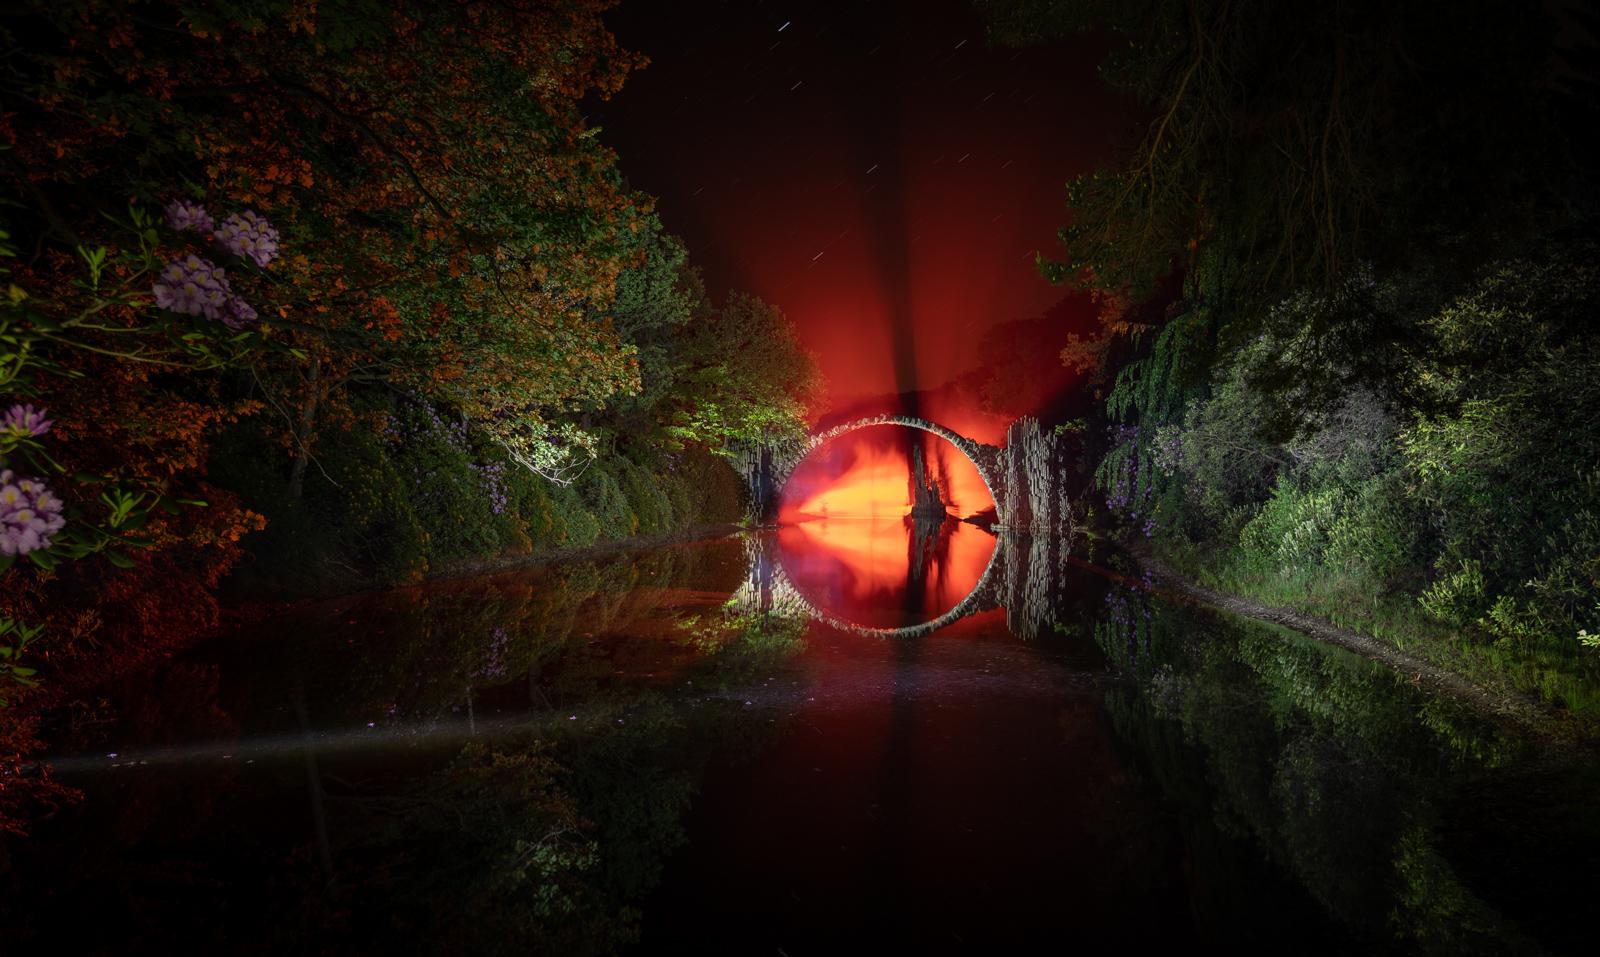 2017_LightPainting-Rakotzbruecke-red.jpg